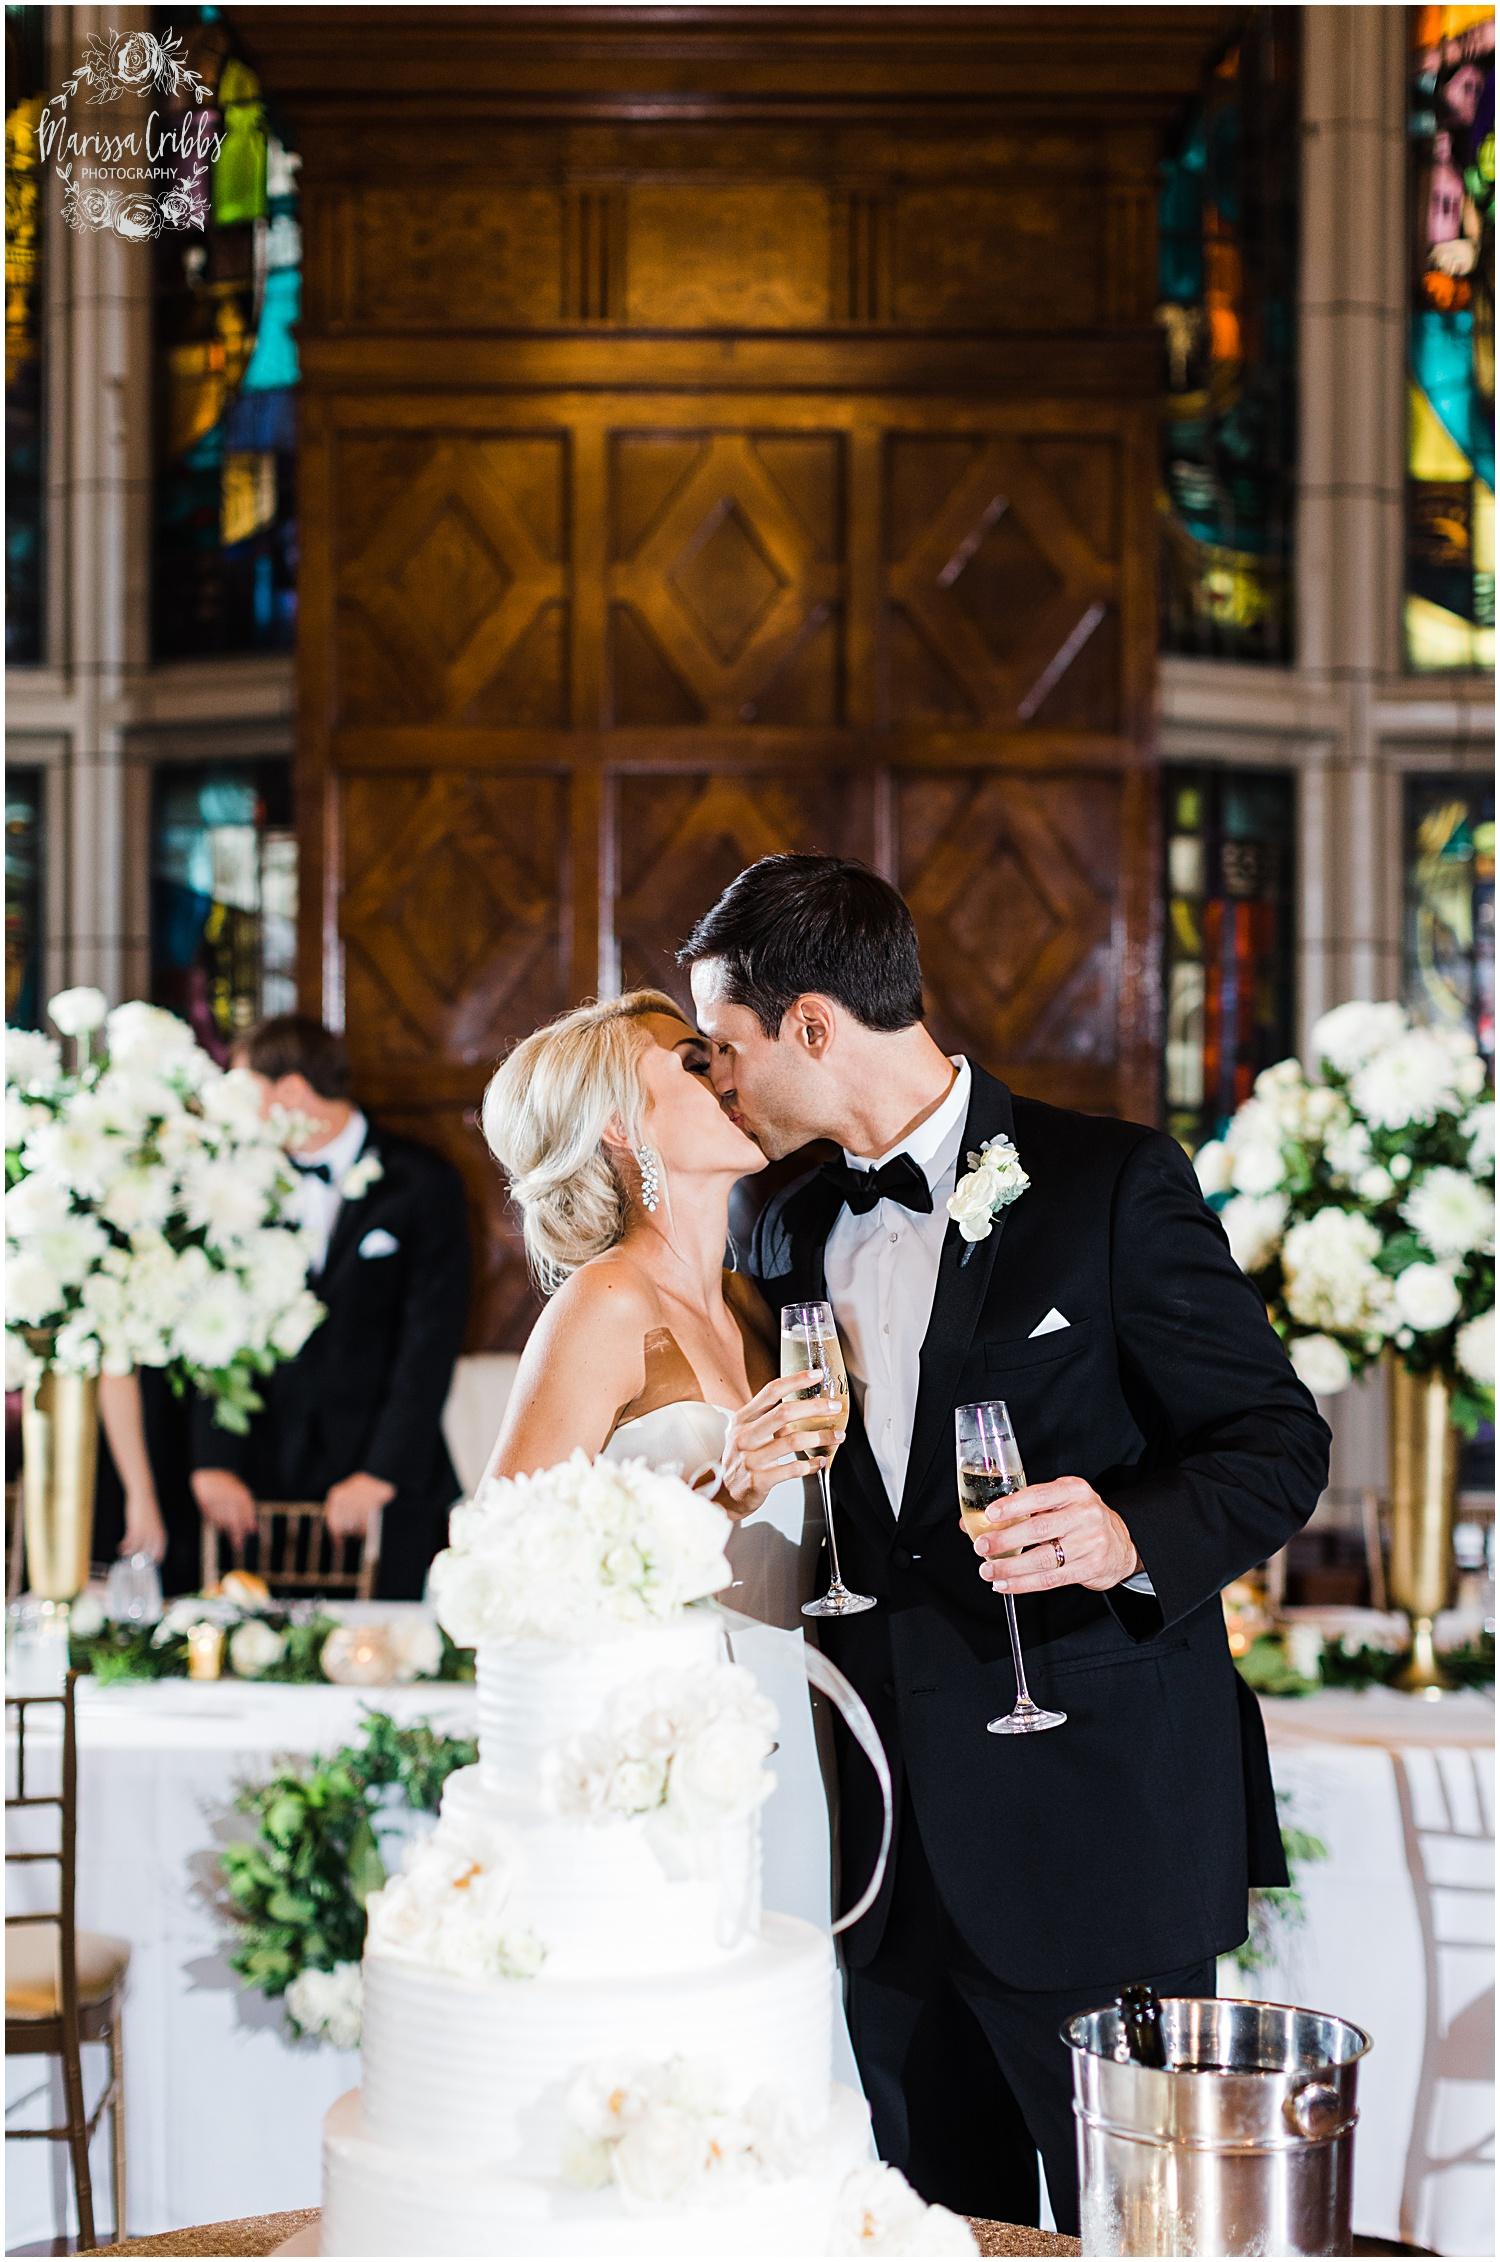 NOLL WEDDING | THE BRASS ON BALTIMORE | MARISSA CRIBBS PHOTOGRAPHY_6362.jpg